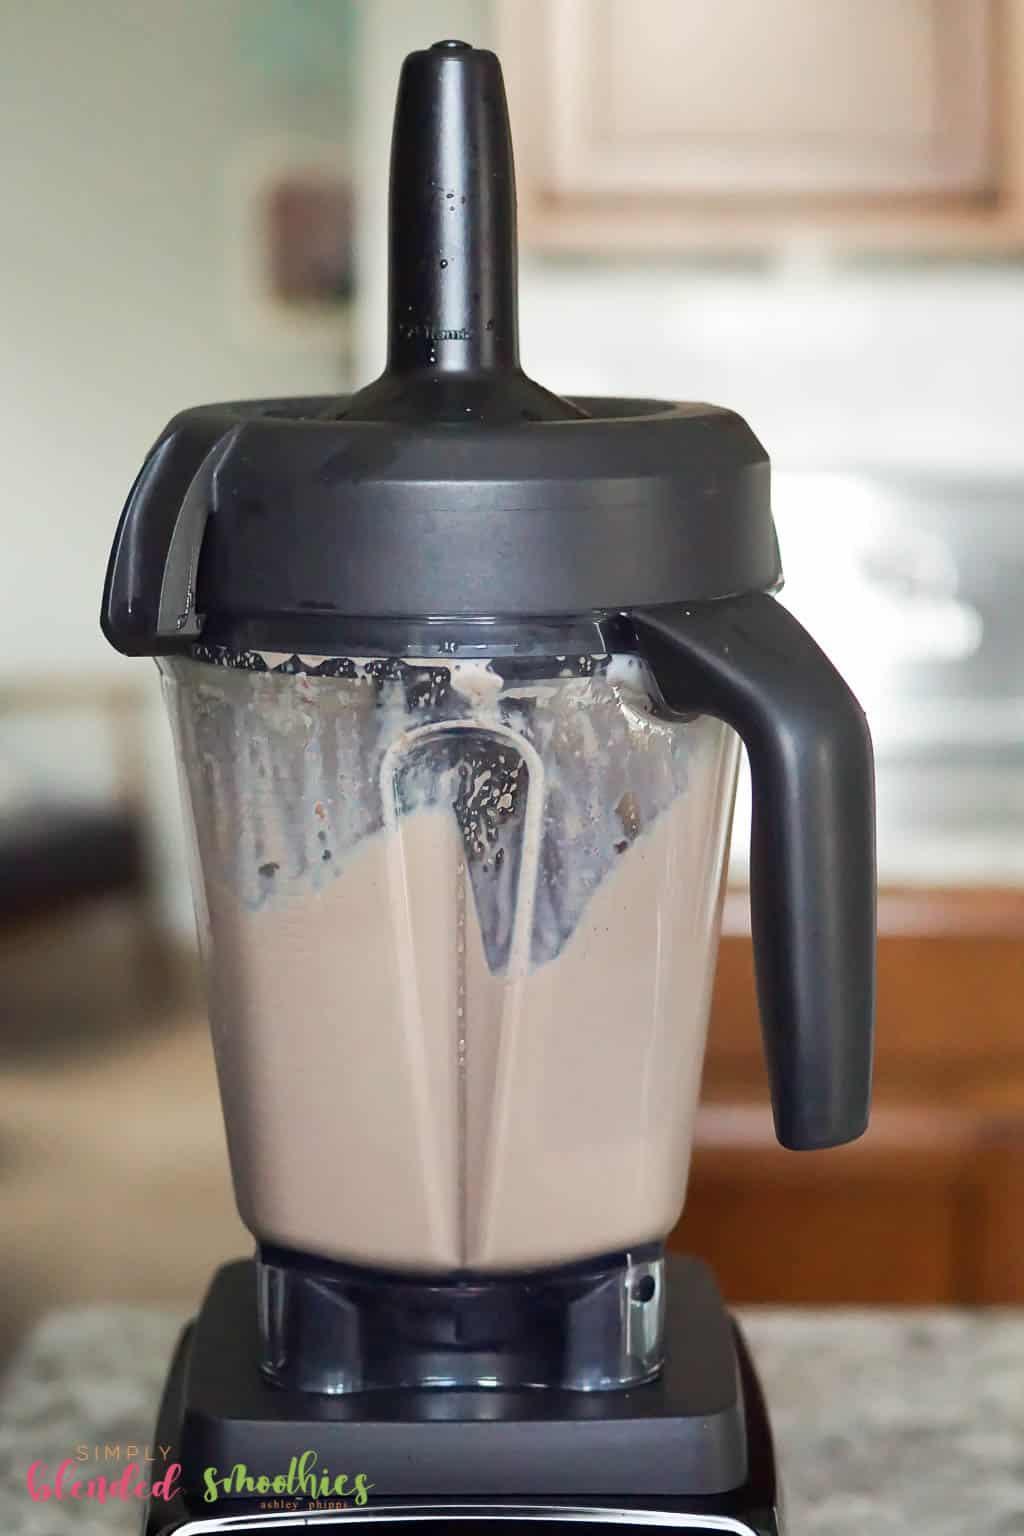 blend chocolate shake ingredients in a blender